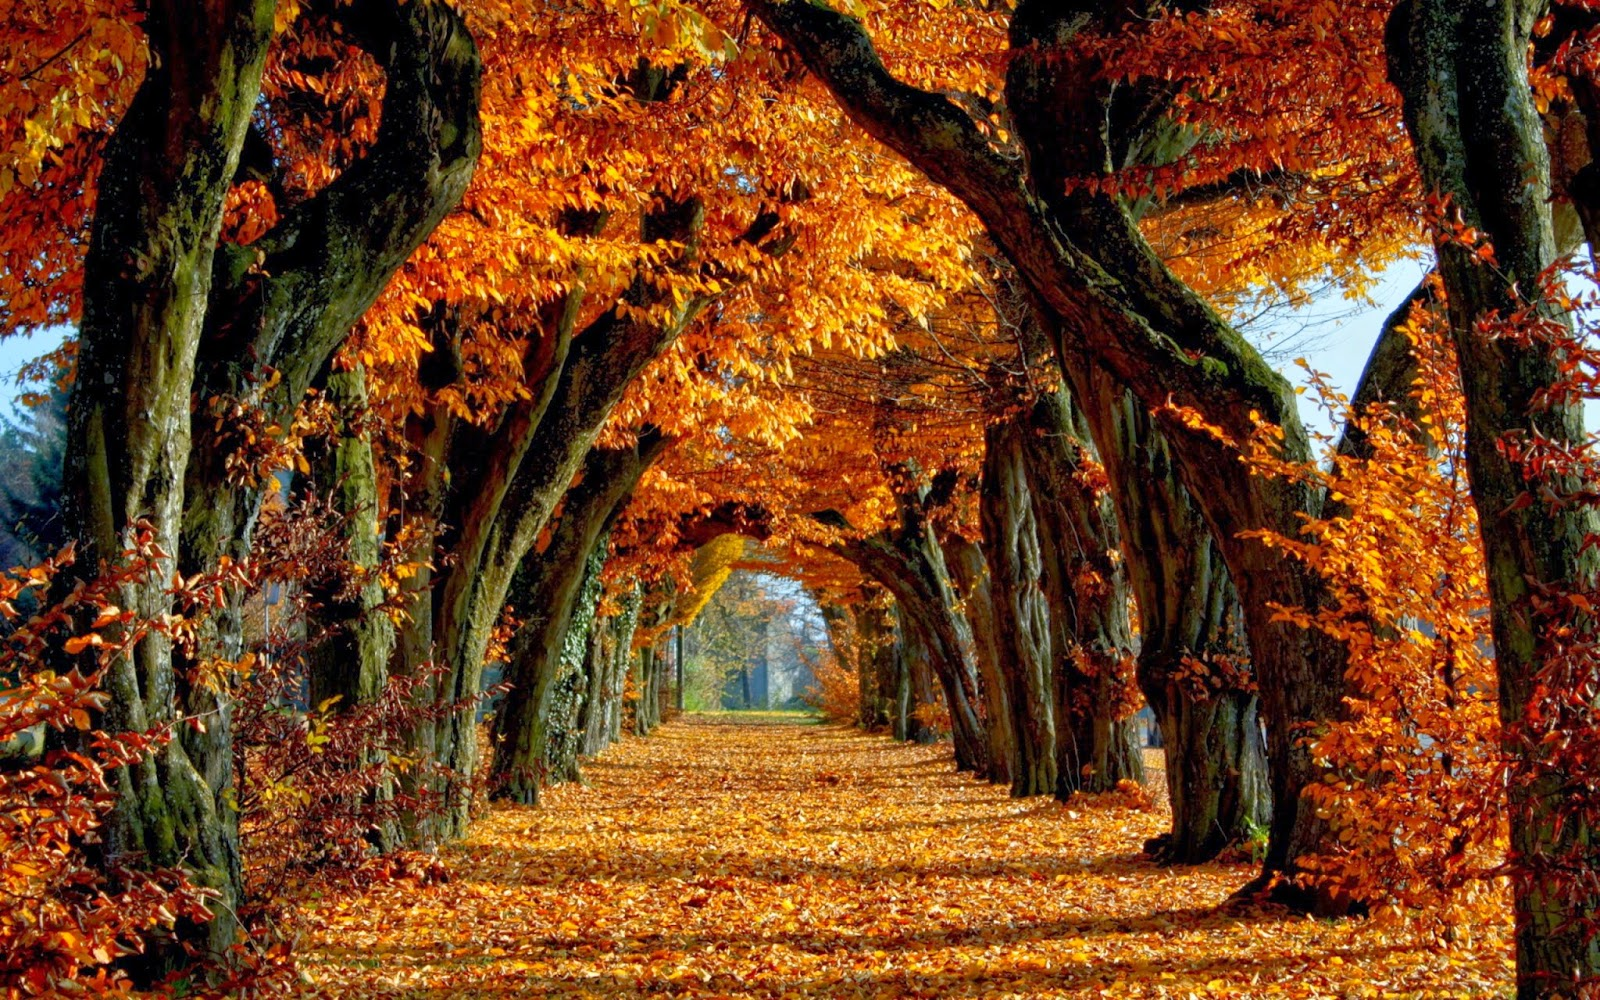 Autumn Desktop Wallpaper 2014 Picture Gallery 1600x1000